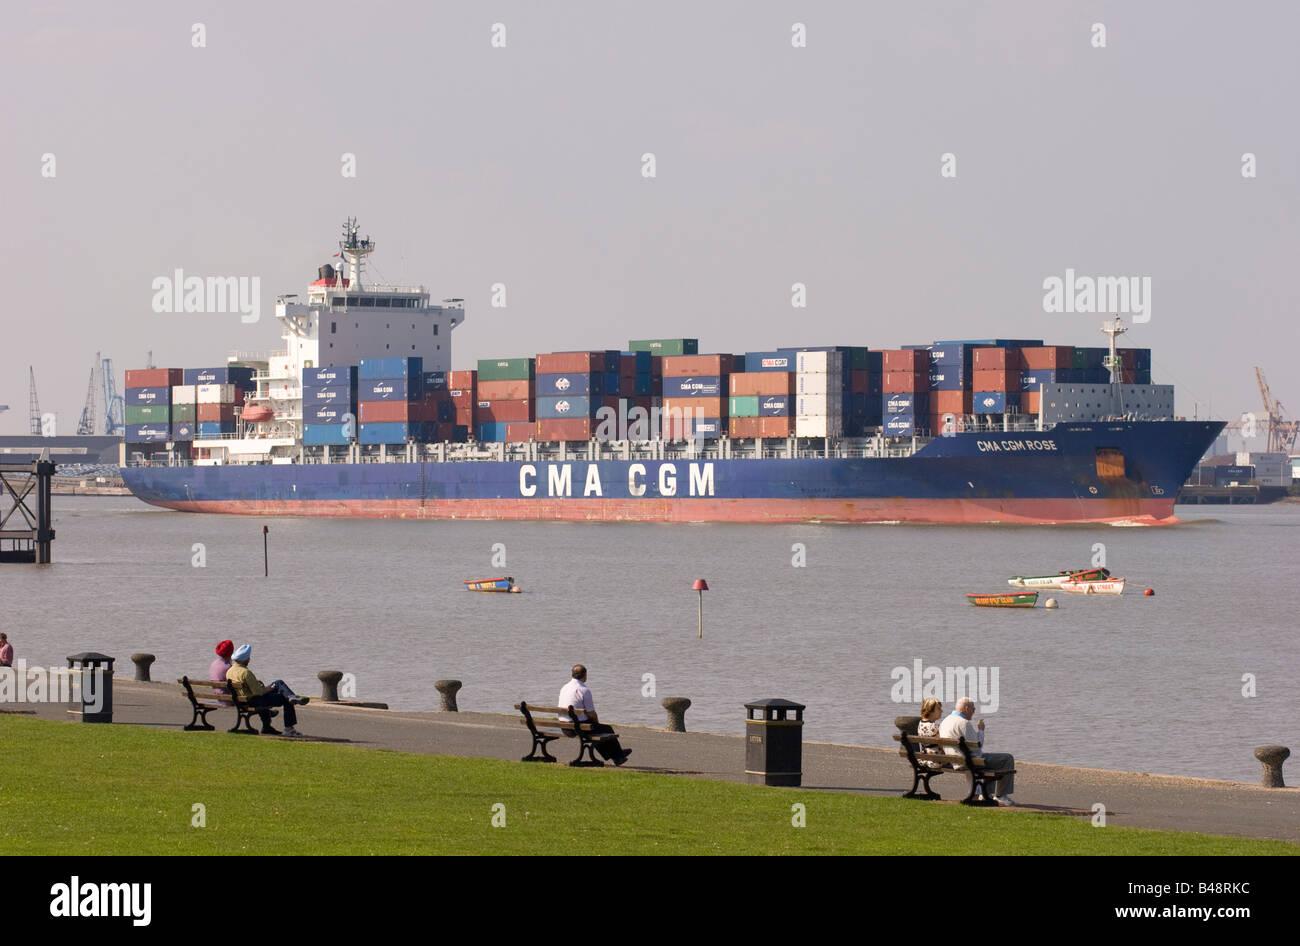 CMA CGM Rose Monrovia container ship sailing down the Thames Estuary at Gravesend - Stock Image